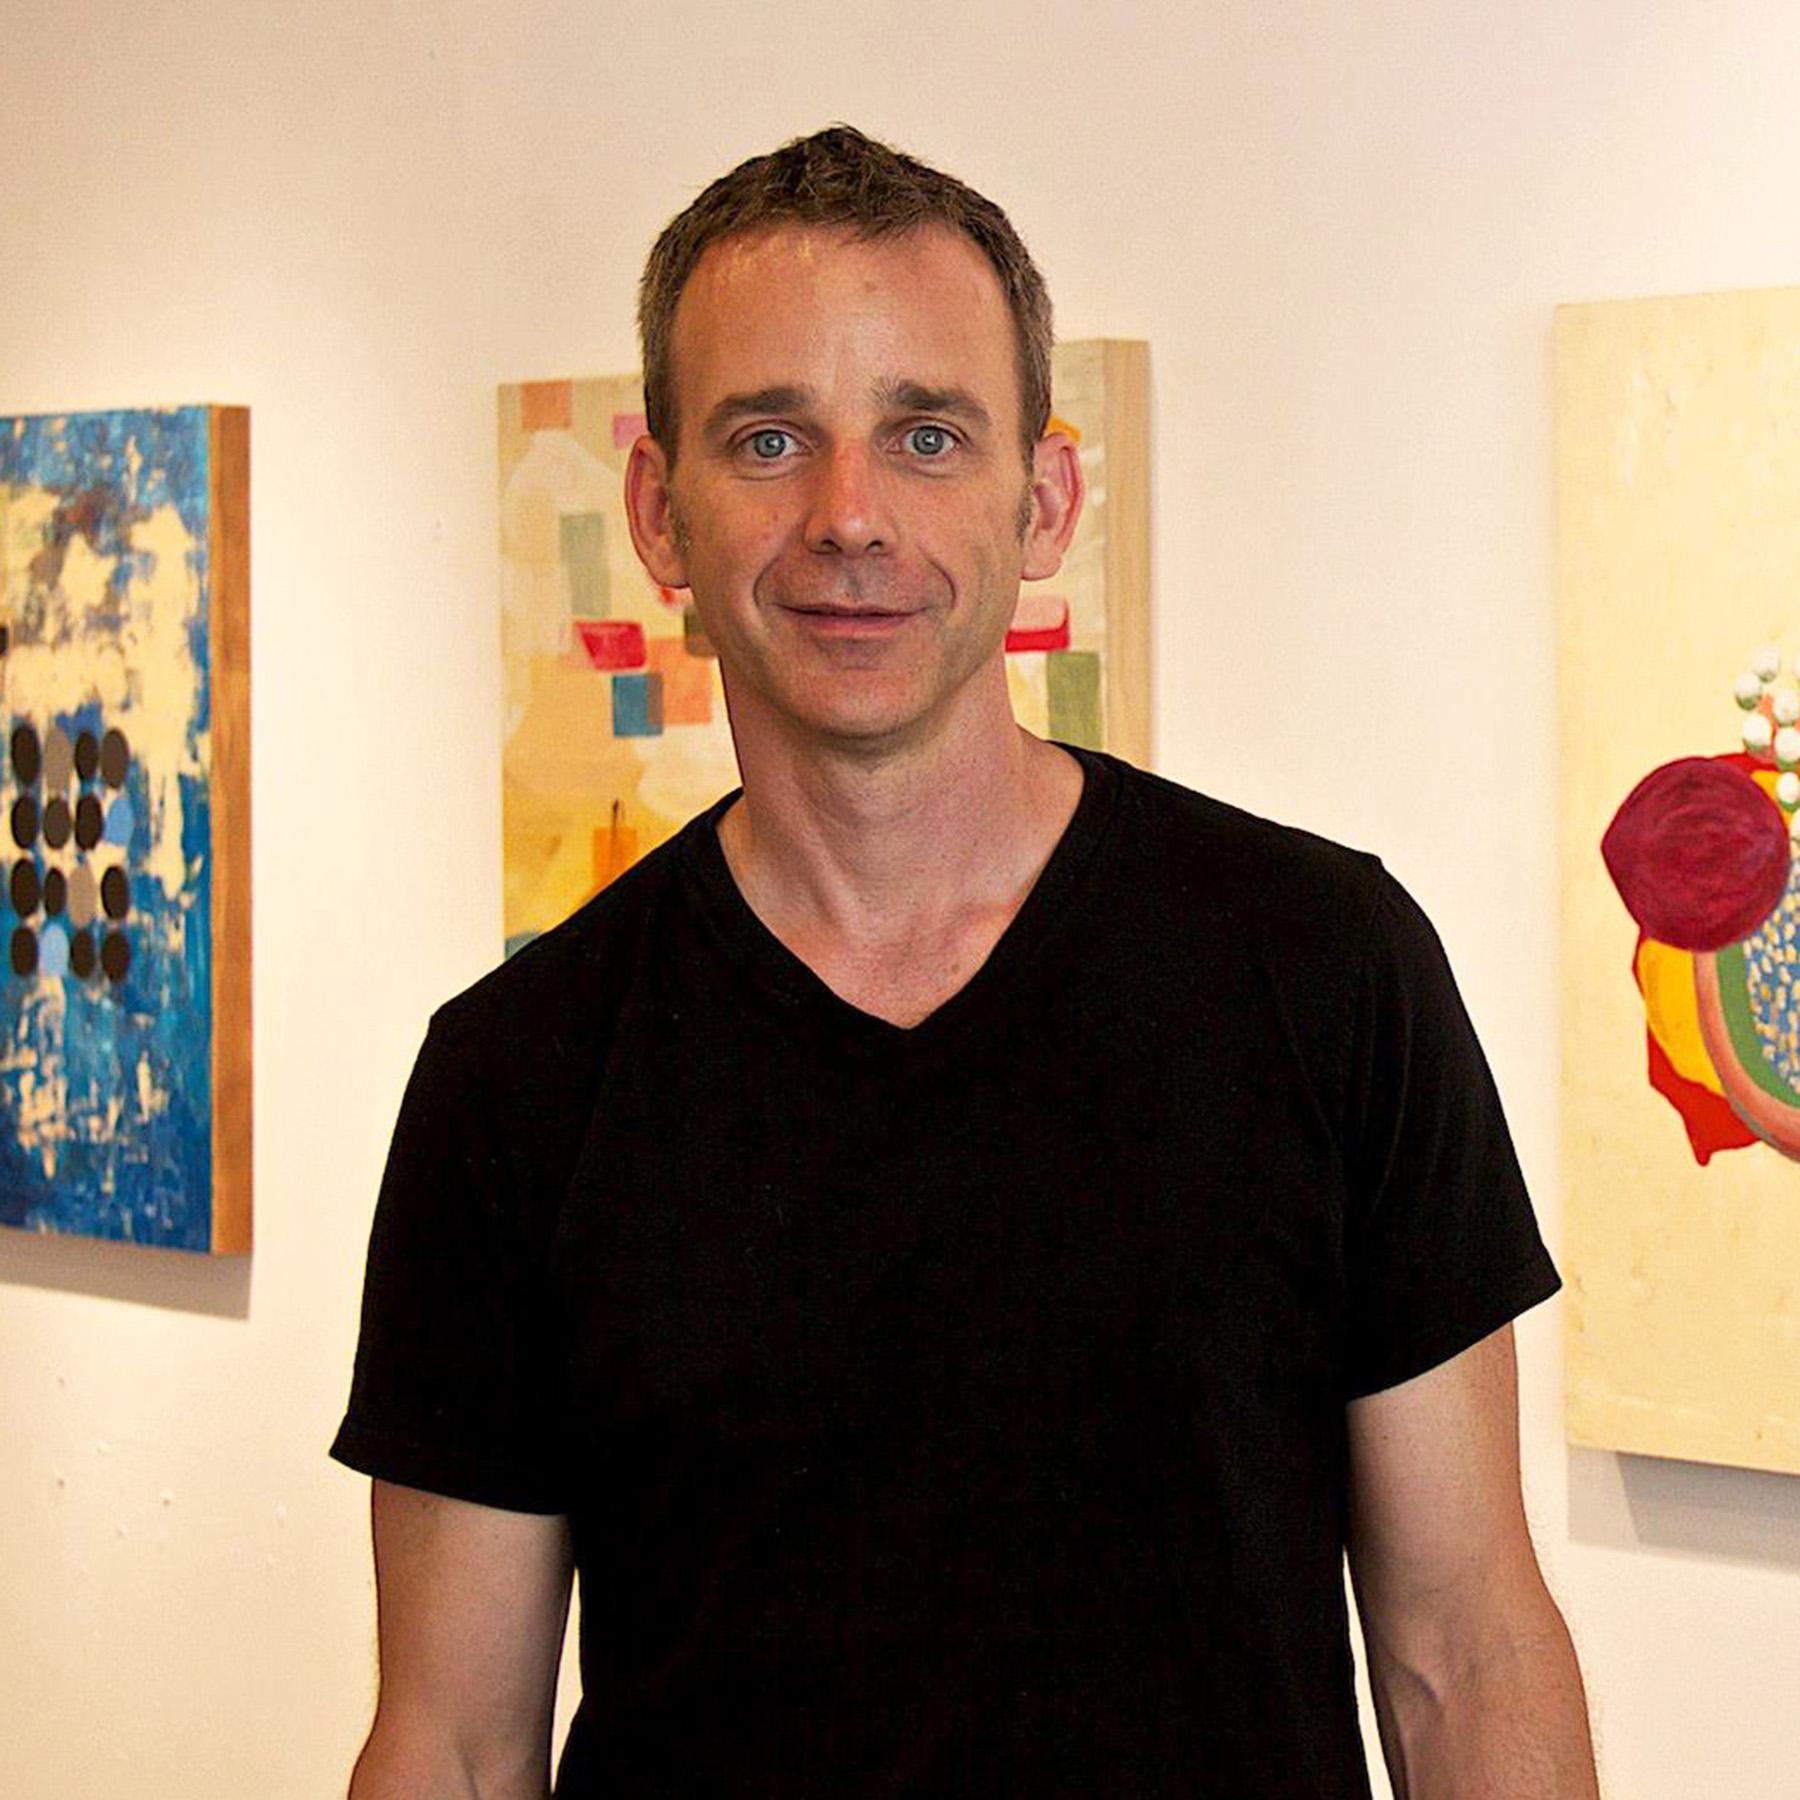 Andrew Long